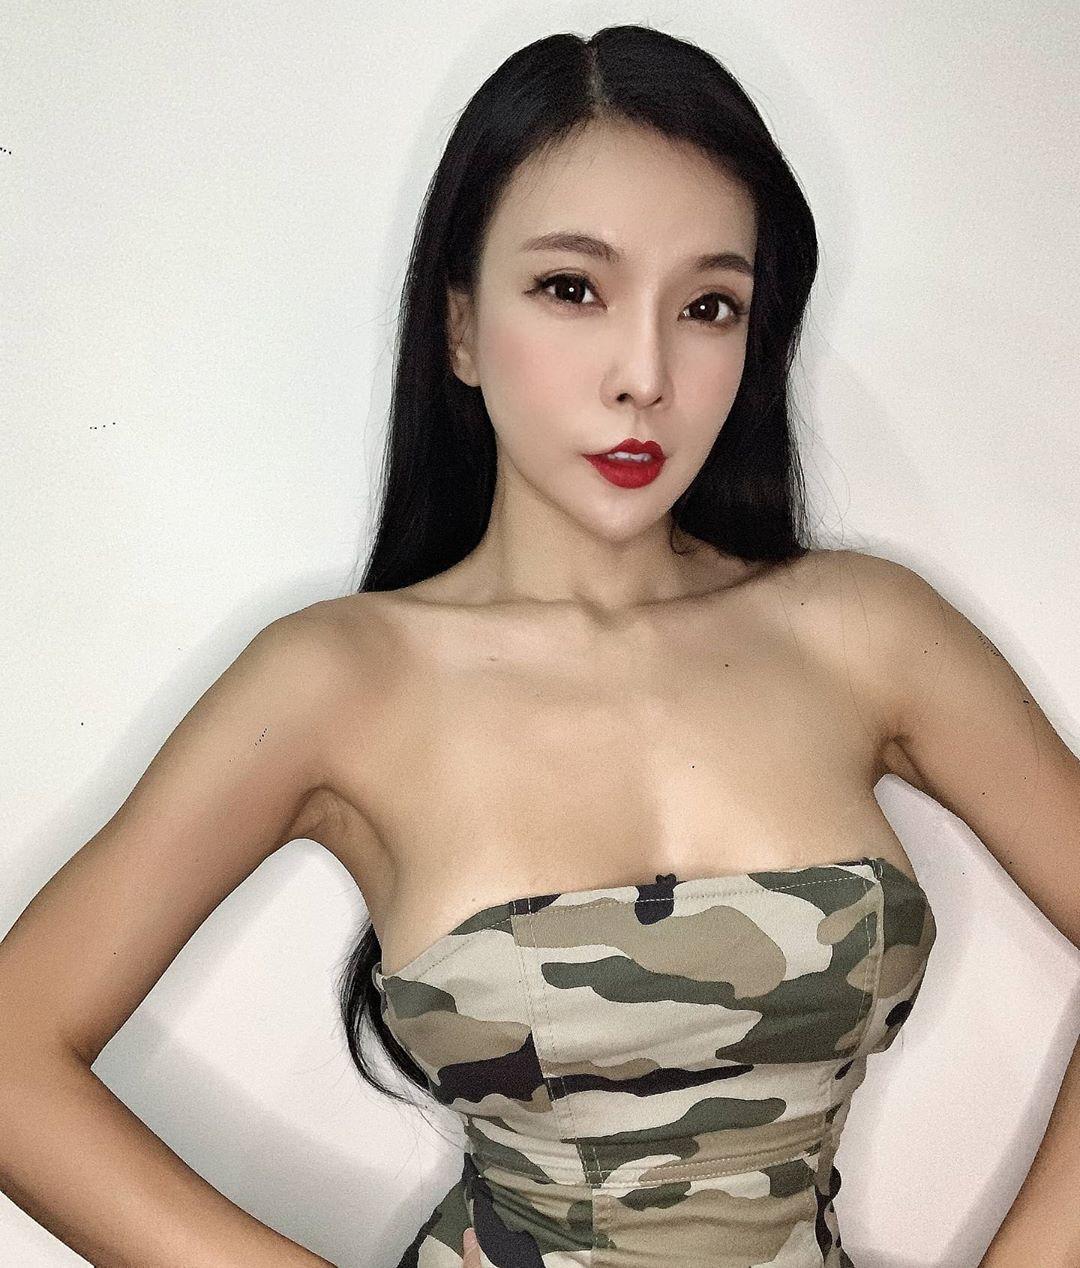 RC9zlwWL o - IG正妹—Jocelyn Kao牛奶兒